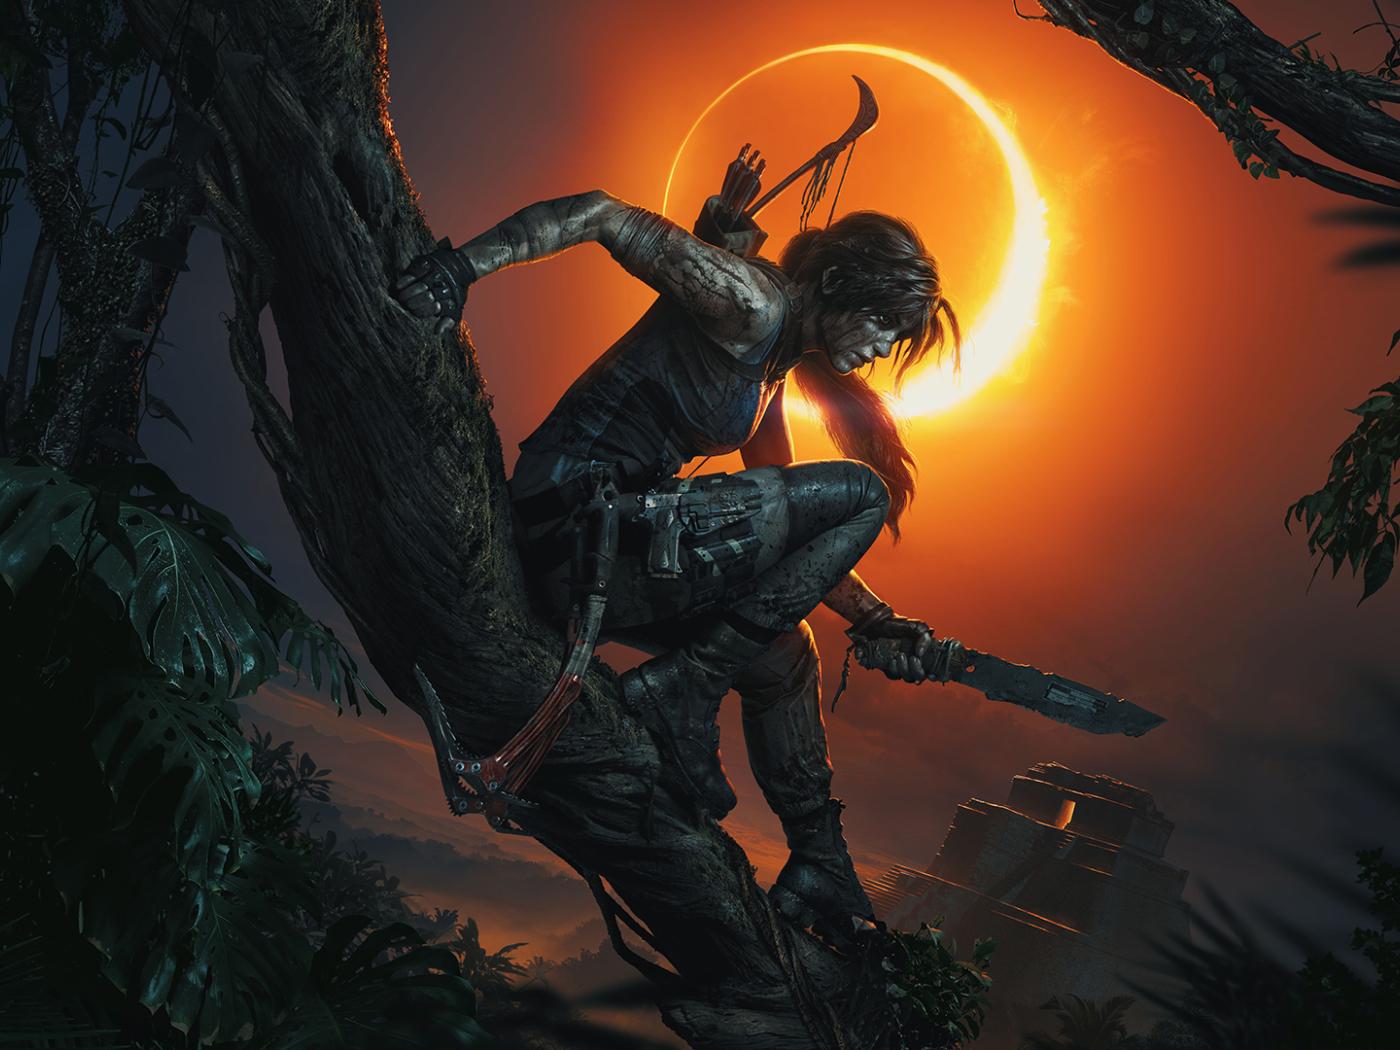 7680x4320 Lara Croft 8k Artwork 8k Hd 4k Wallpapers: Lara Croft Shadow Of The Tomb Raider, Full HD Wallpaper